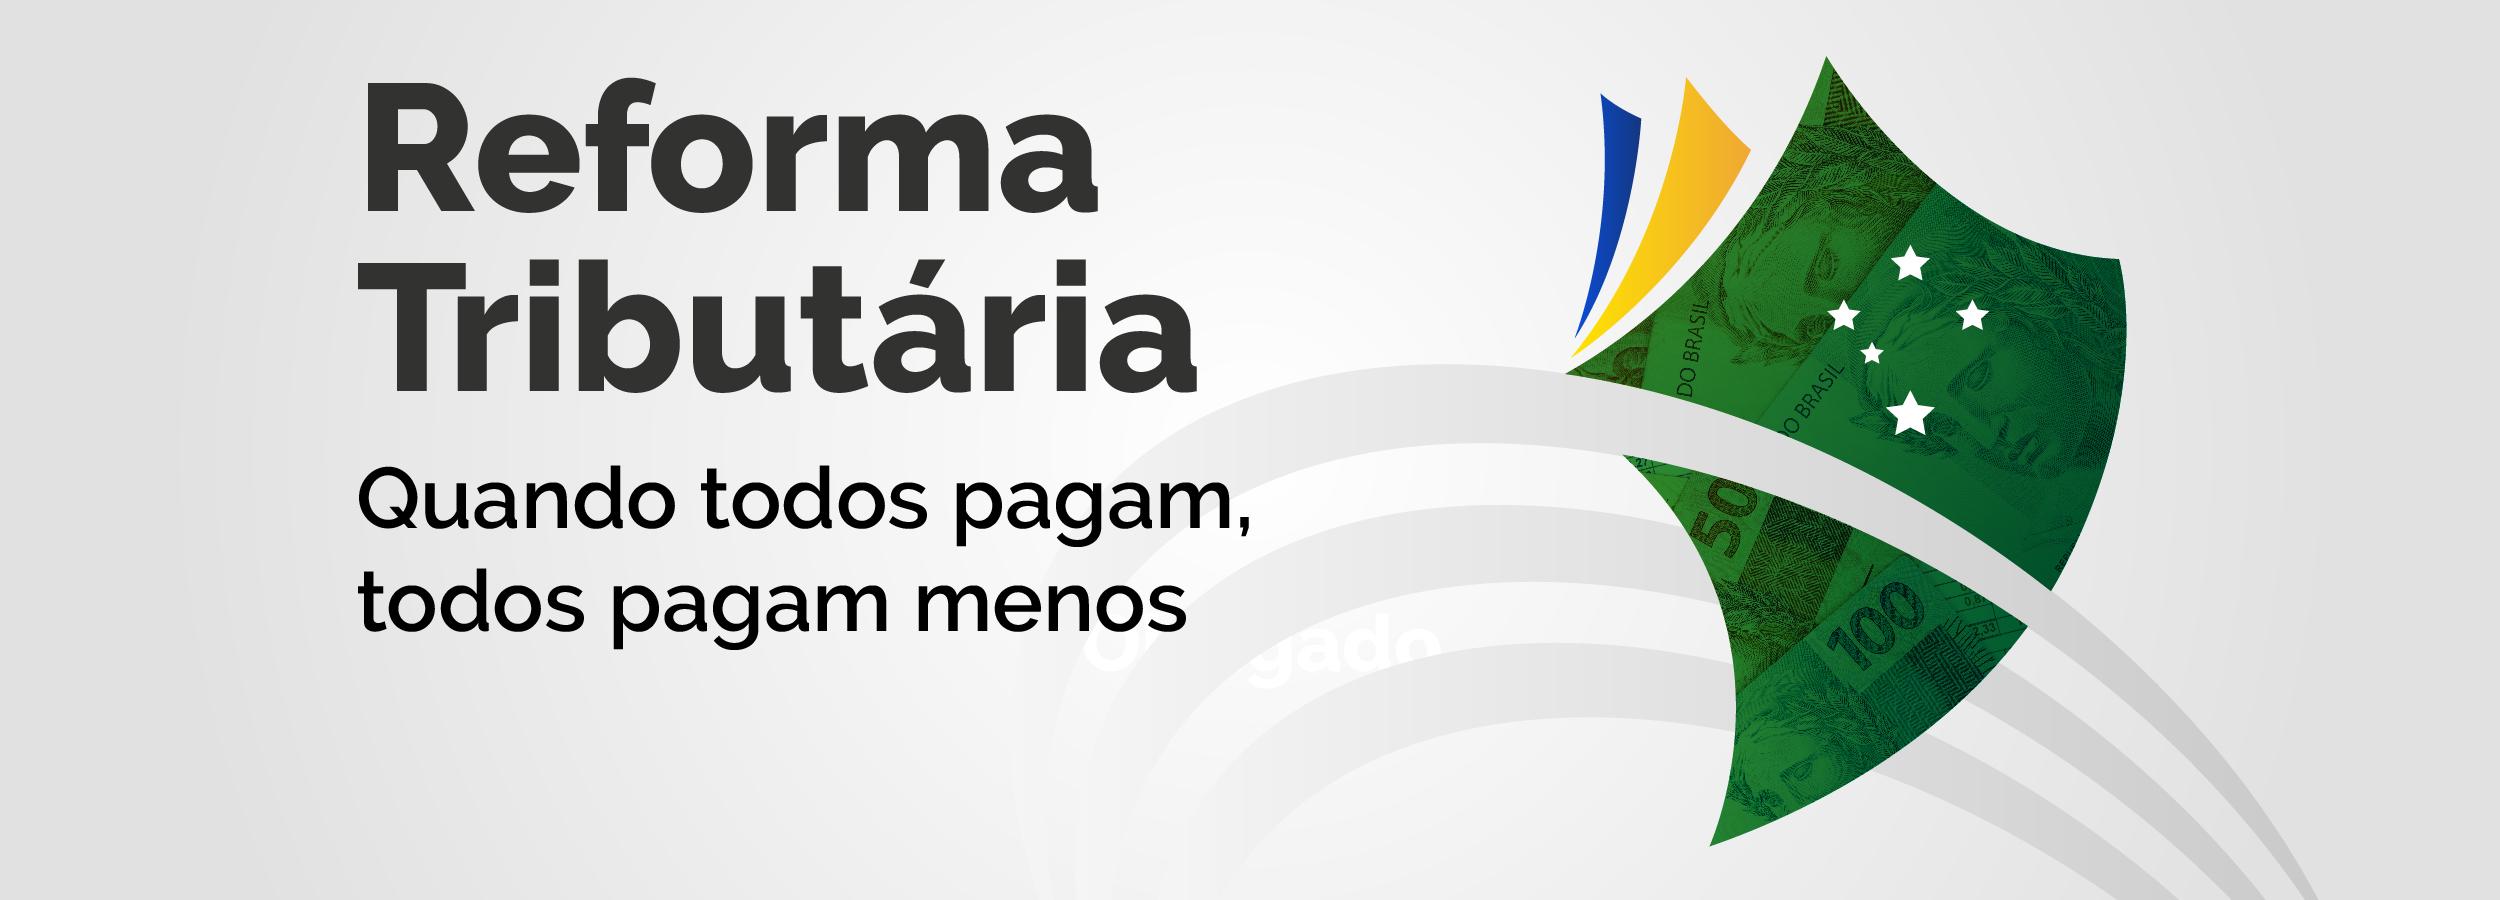 Reforma Tributaria 2-01.jpg